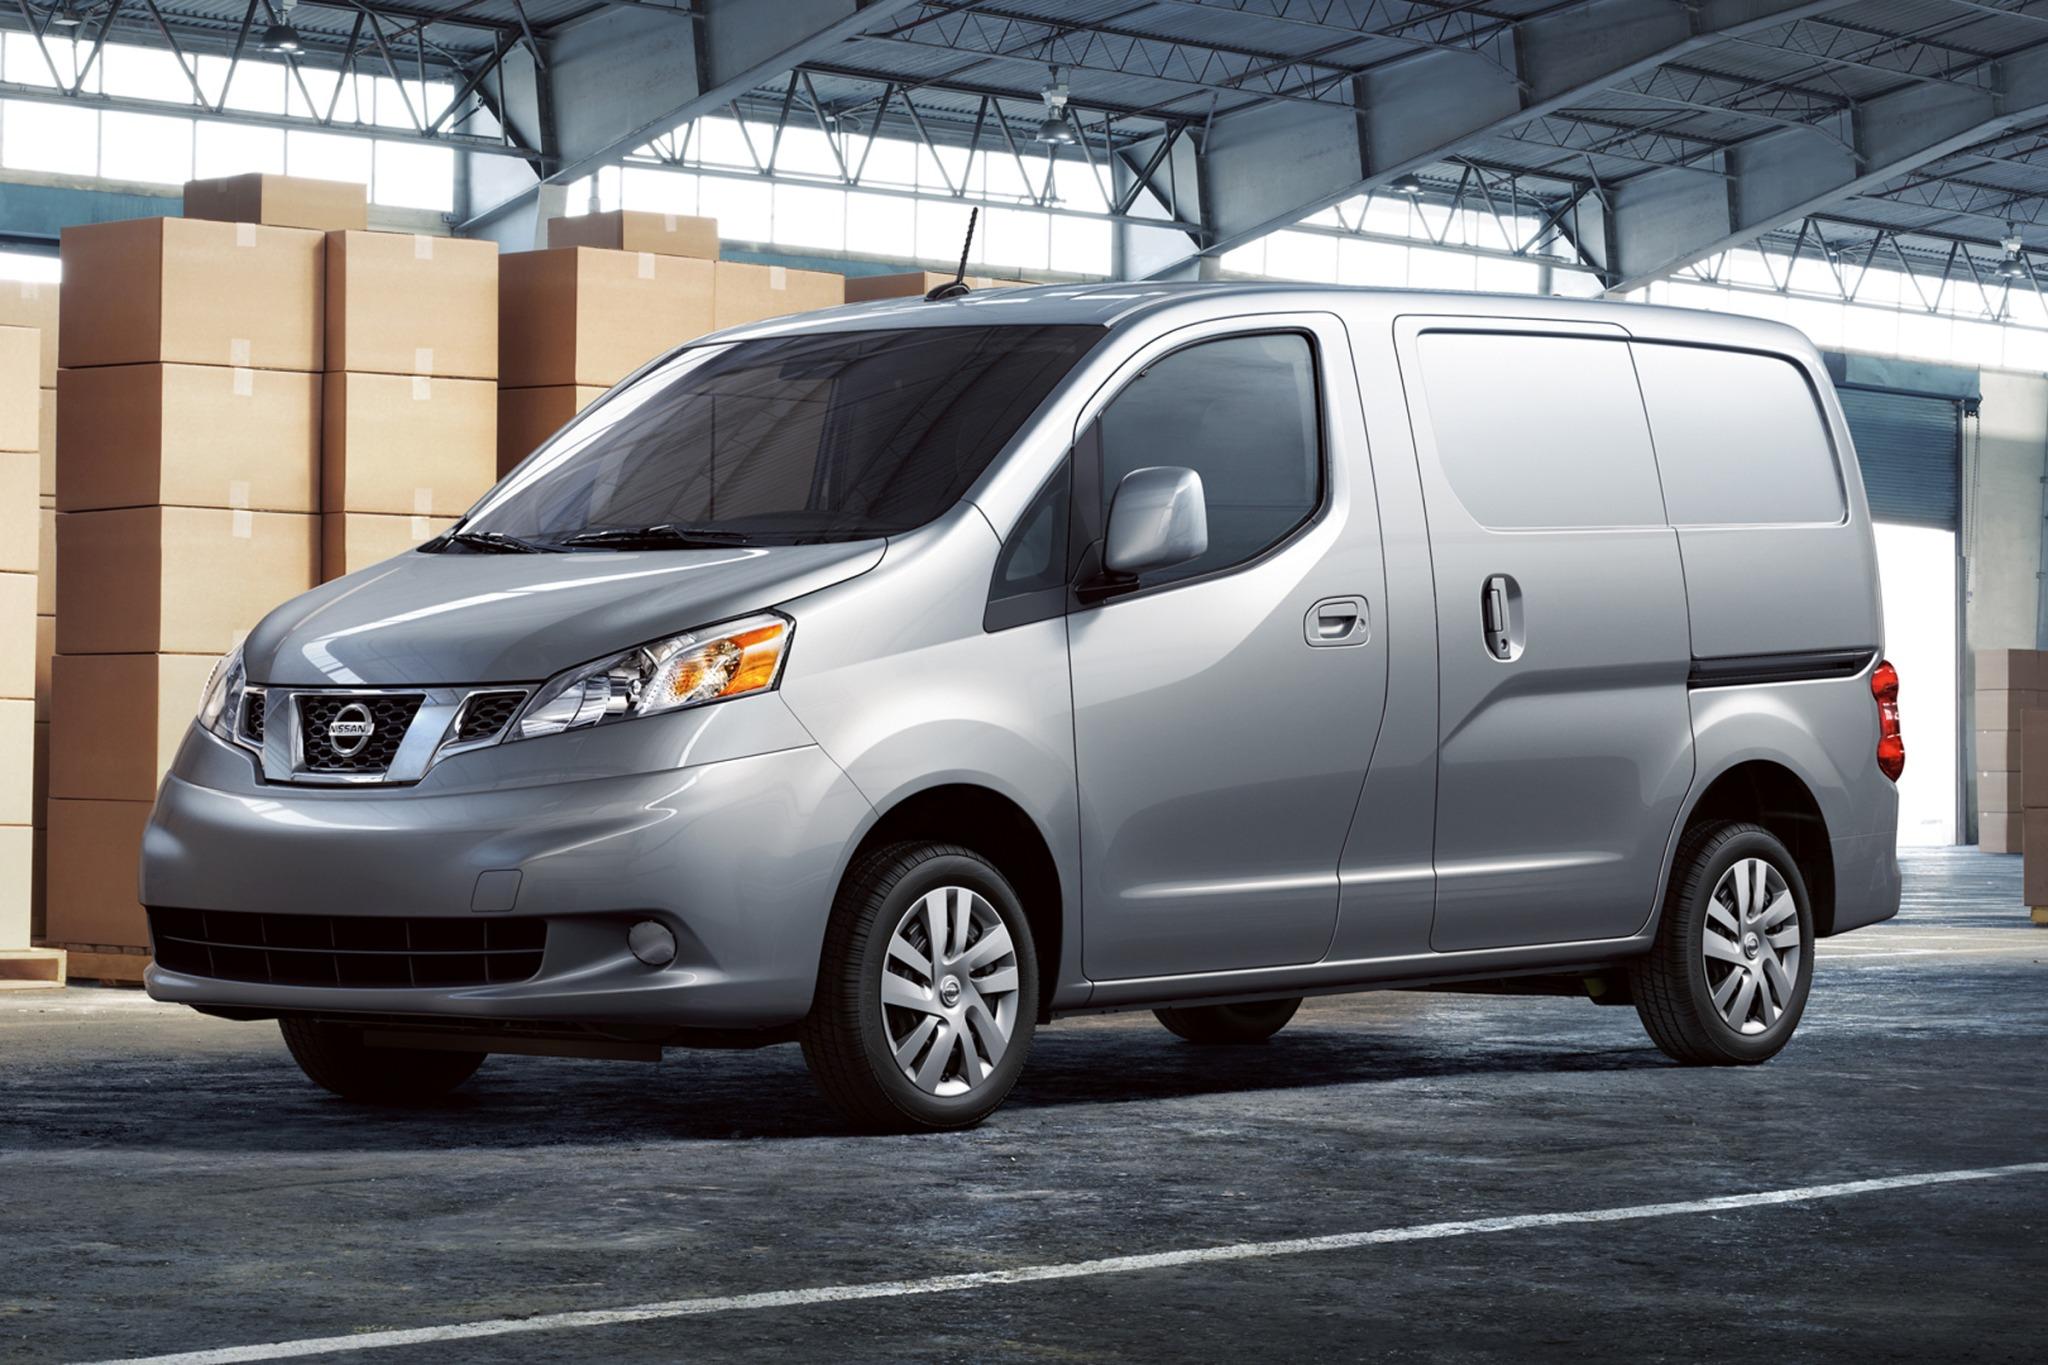 2013 nissan nv200 cargo minivan sv fq oem 2 2048